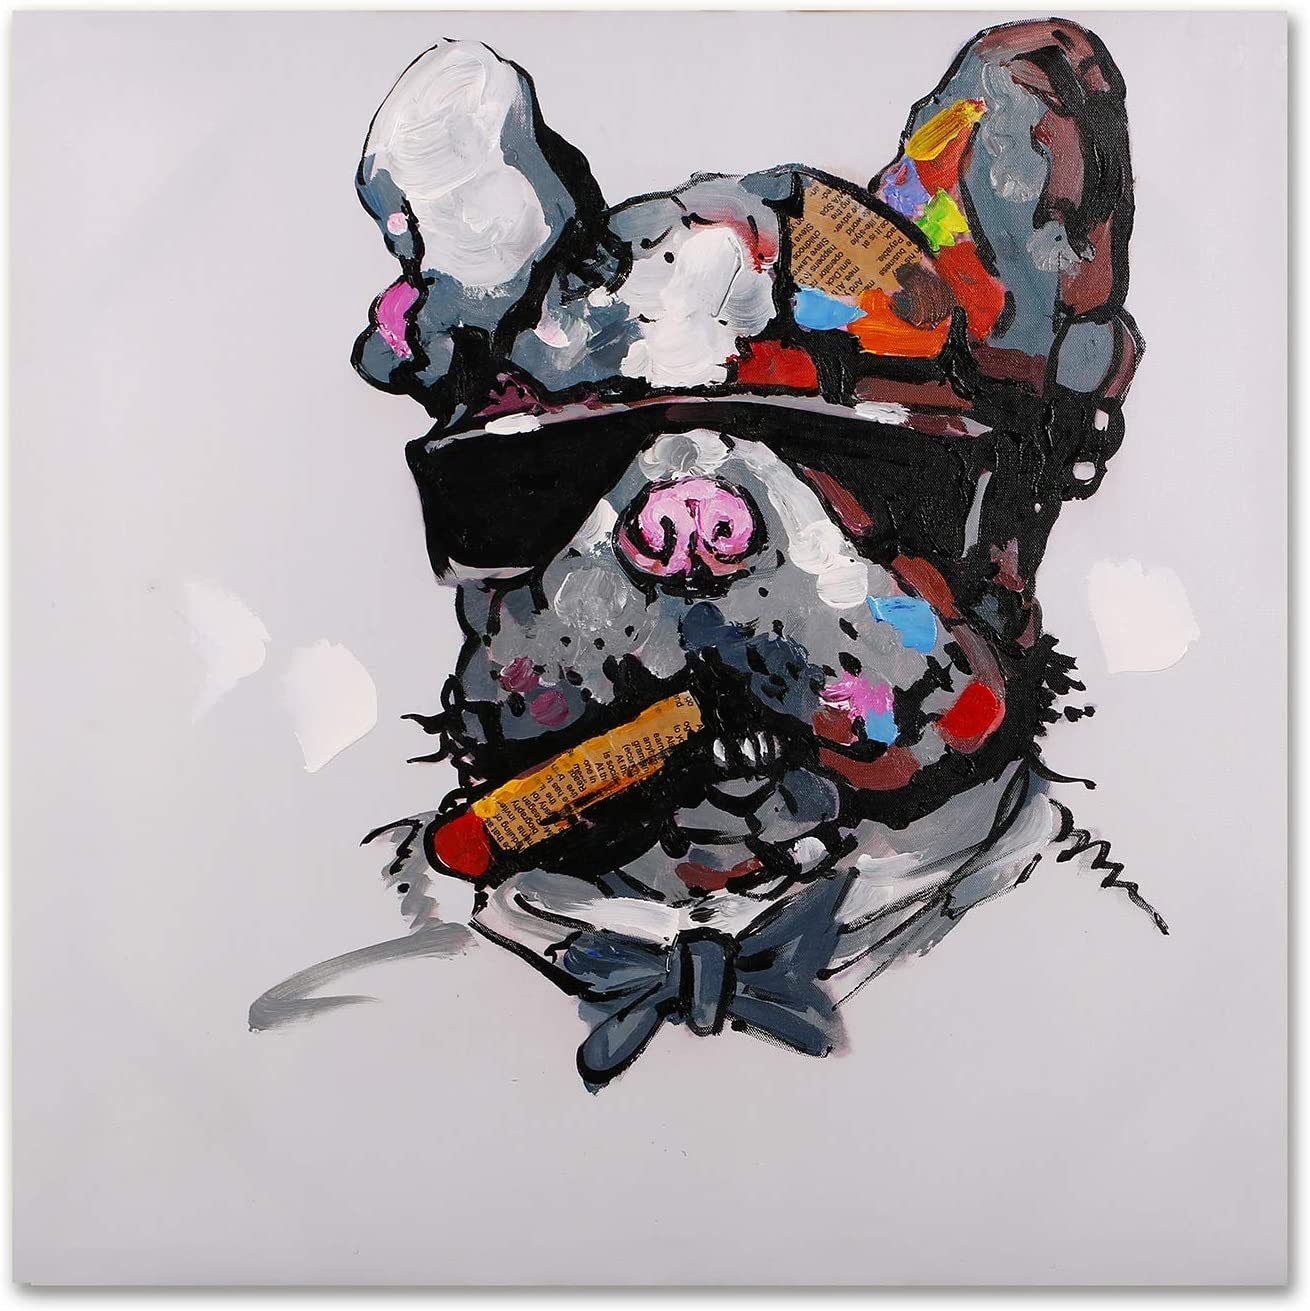 Modern Pop Art Decor - FRAMED - Smoking Pit Bull with Sunglasses Animal Wall Art Canvas Print Home Decor Wall Art, Gallery Wrap Inner Frame, 24x24